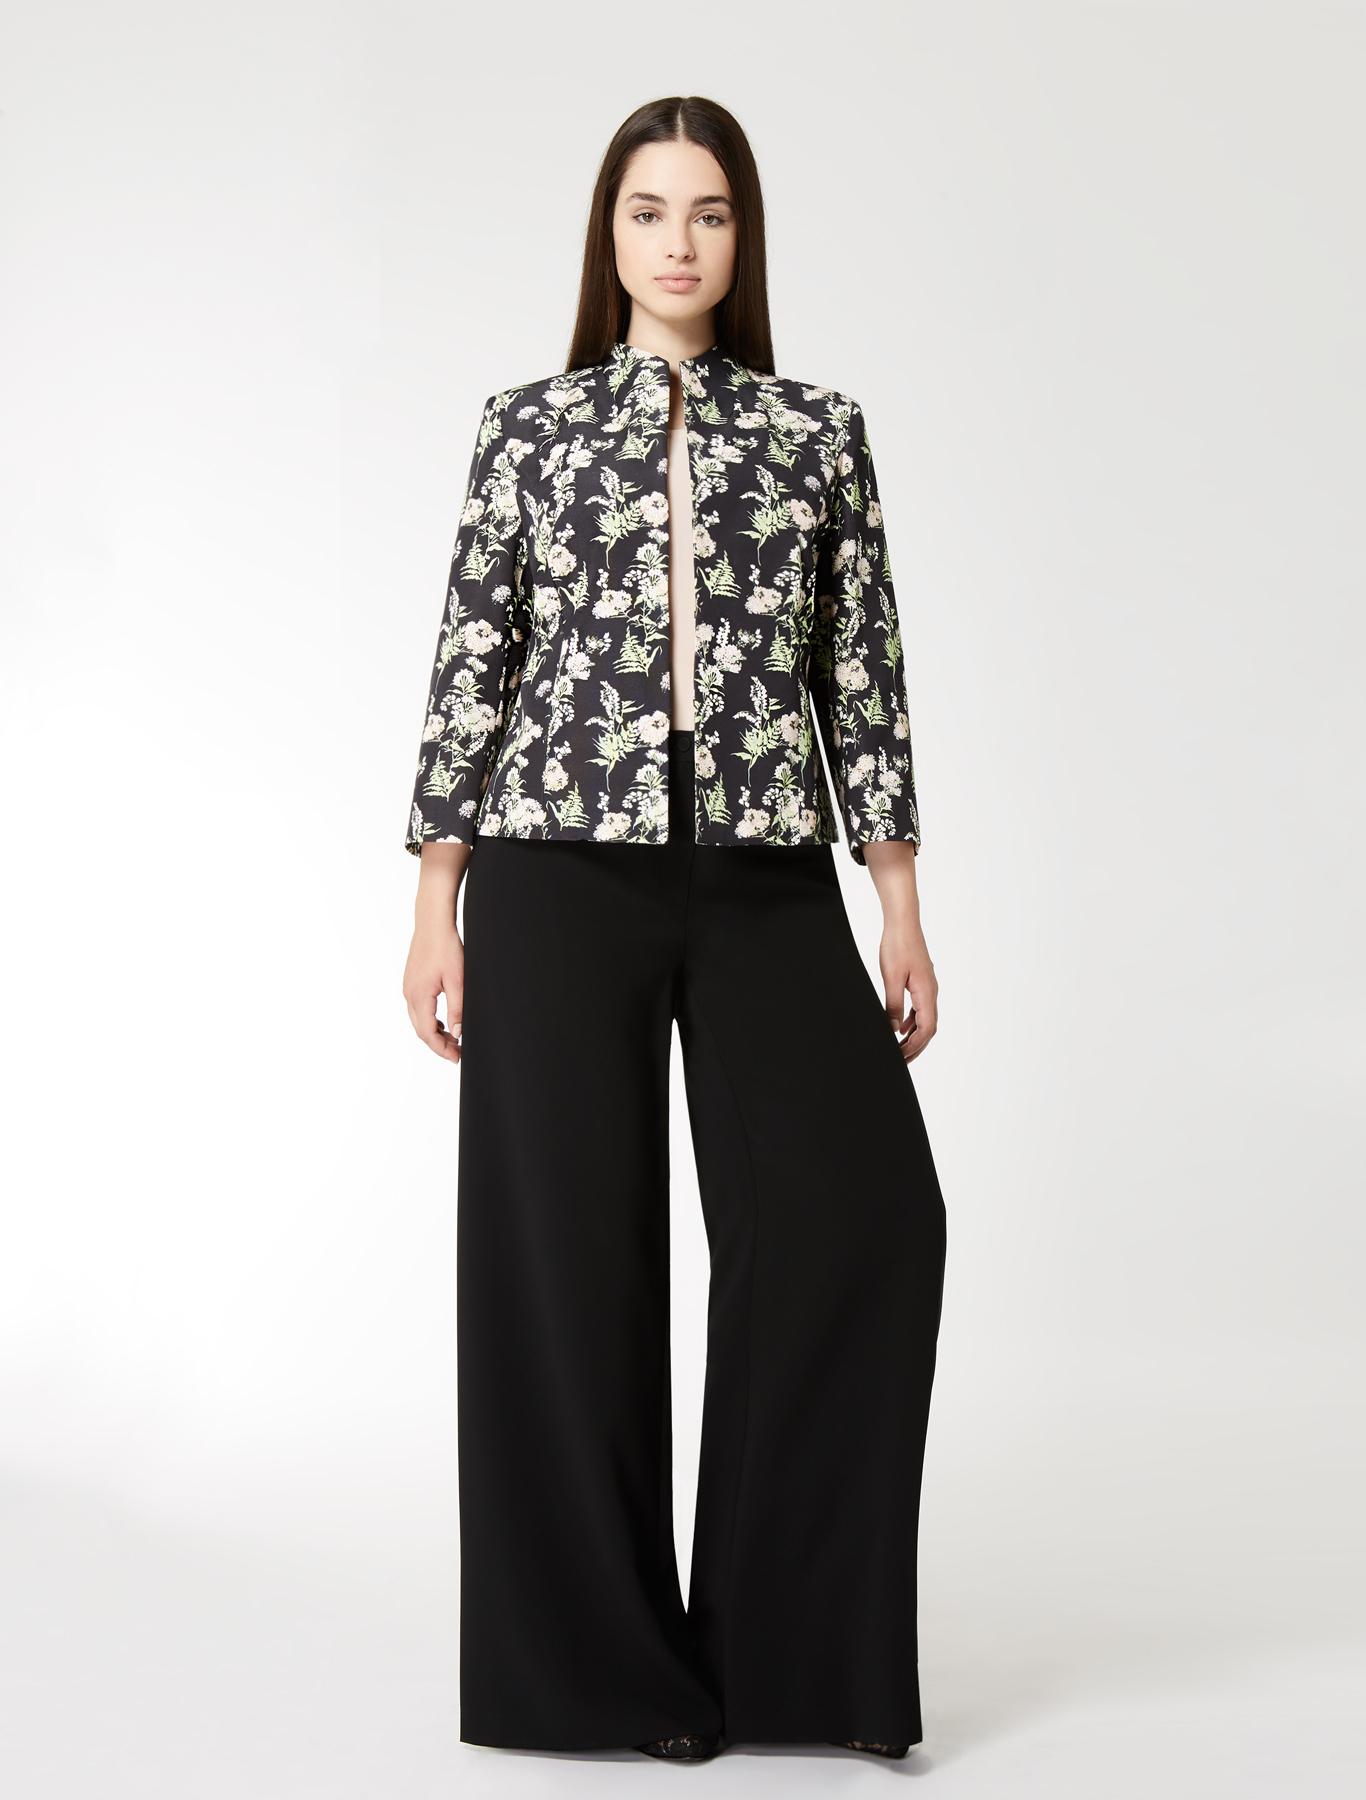 d5af0cccb14c Completo con pantaloni eleganti Marina Rinaldi per taglie forti